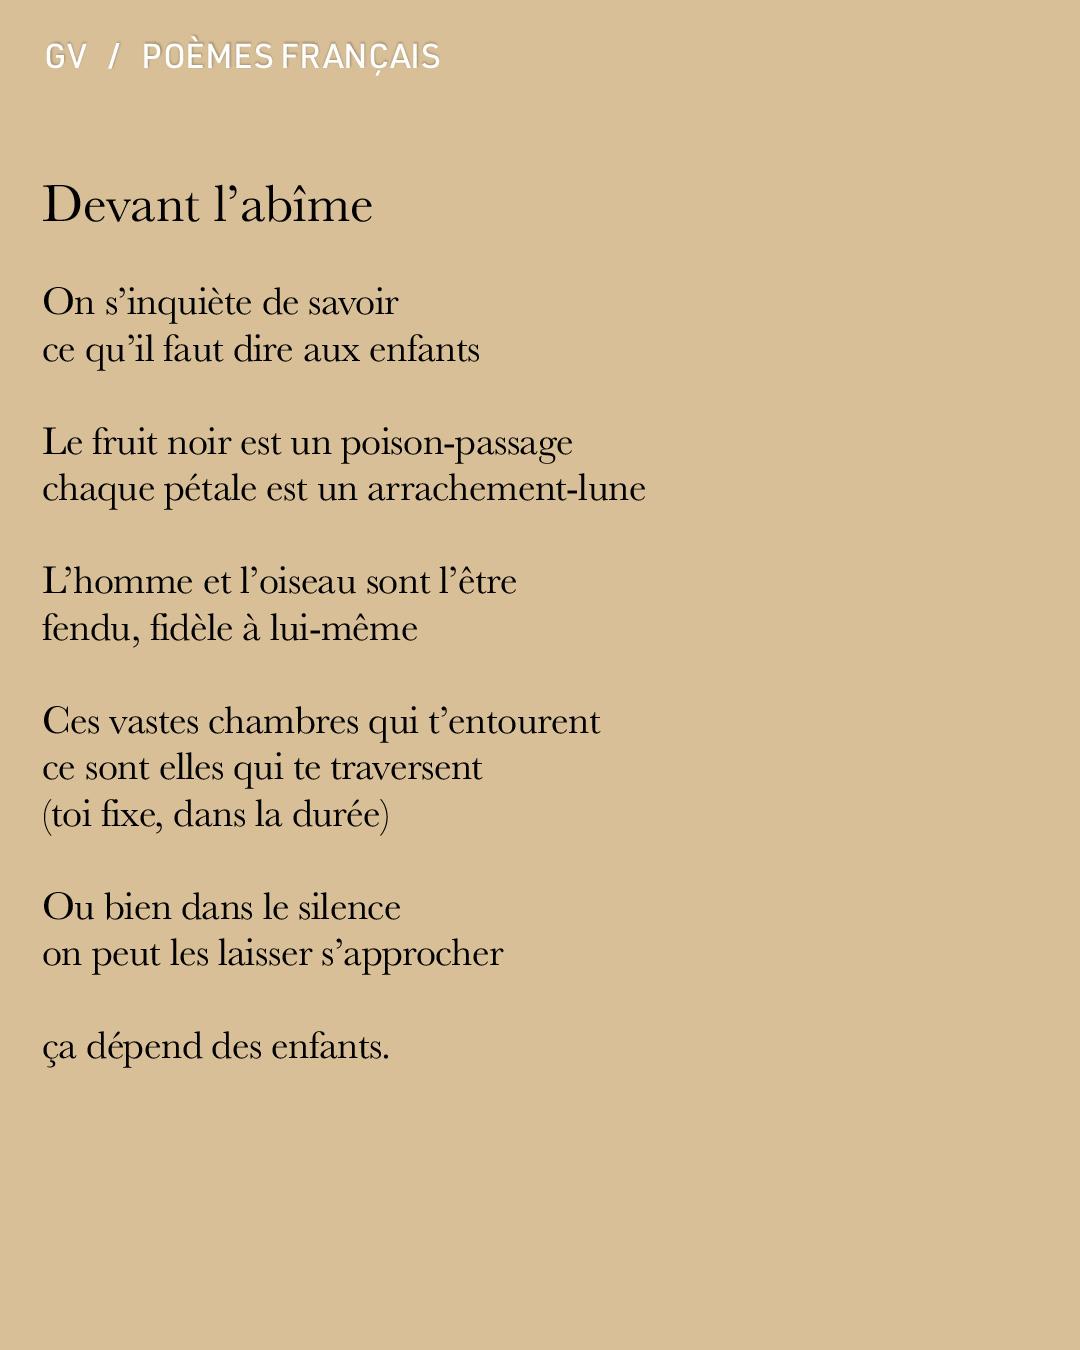 Gvion-PoemesF-DevantLabime.jpg